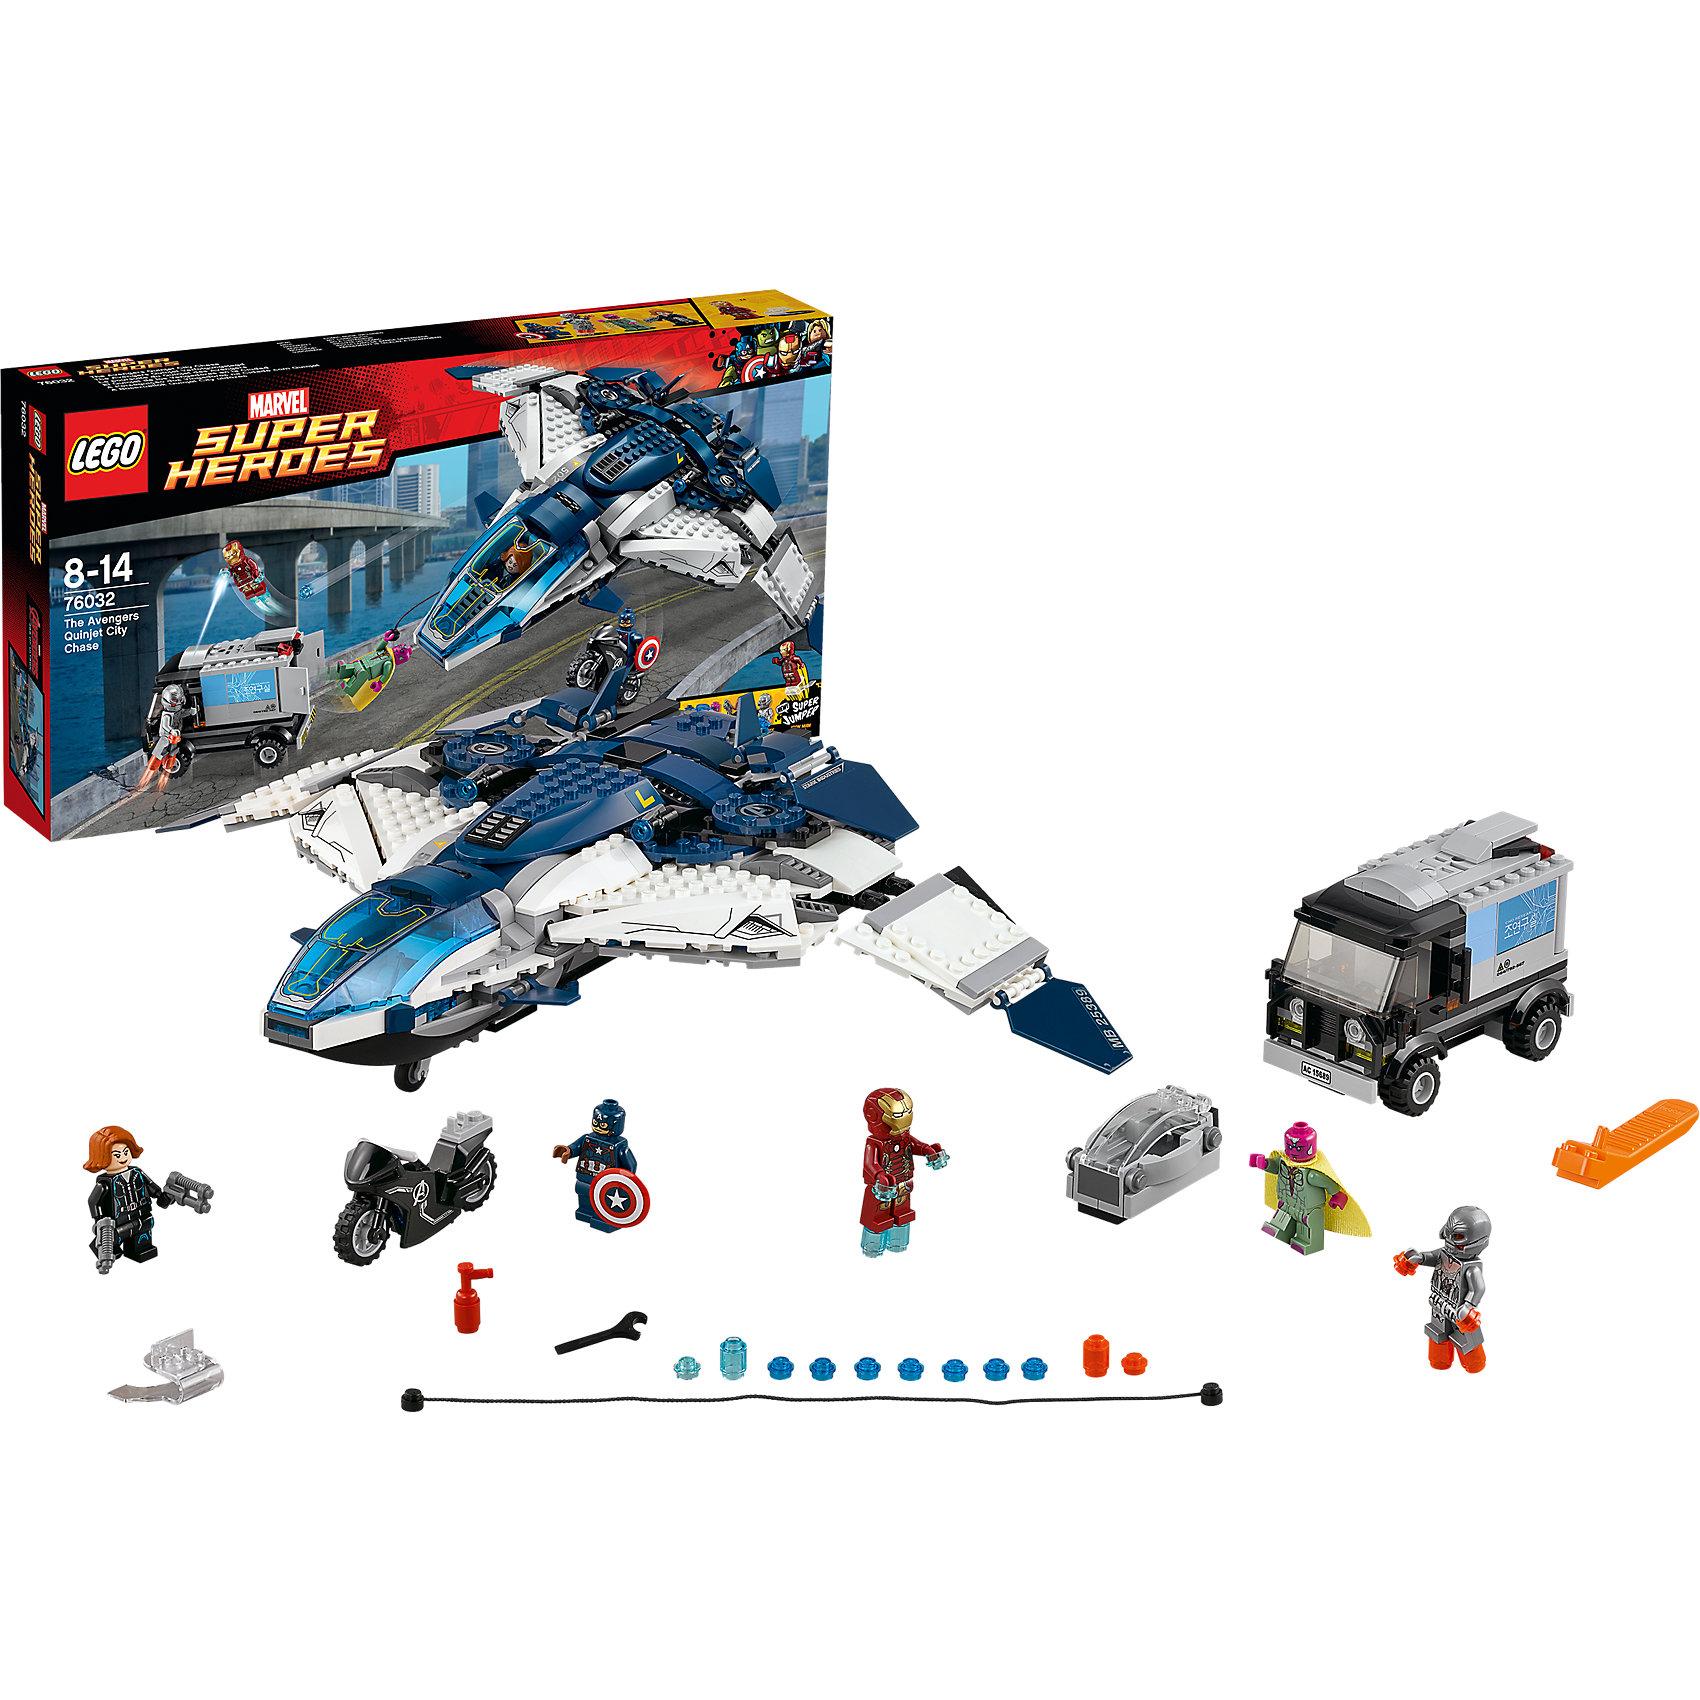 LEGO LEGO Super Heroes 76032: Погоня на Квинджете Мстителей lego super heroes 76059 человек паук в ловушке доктора осьминога